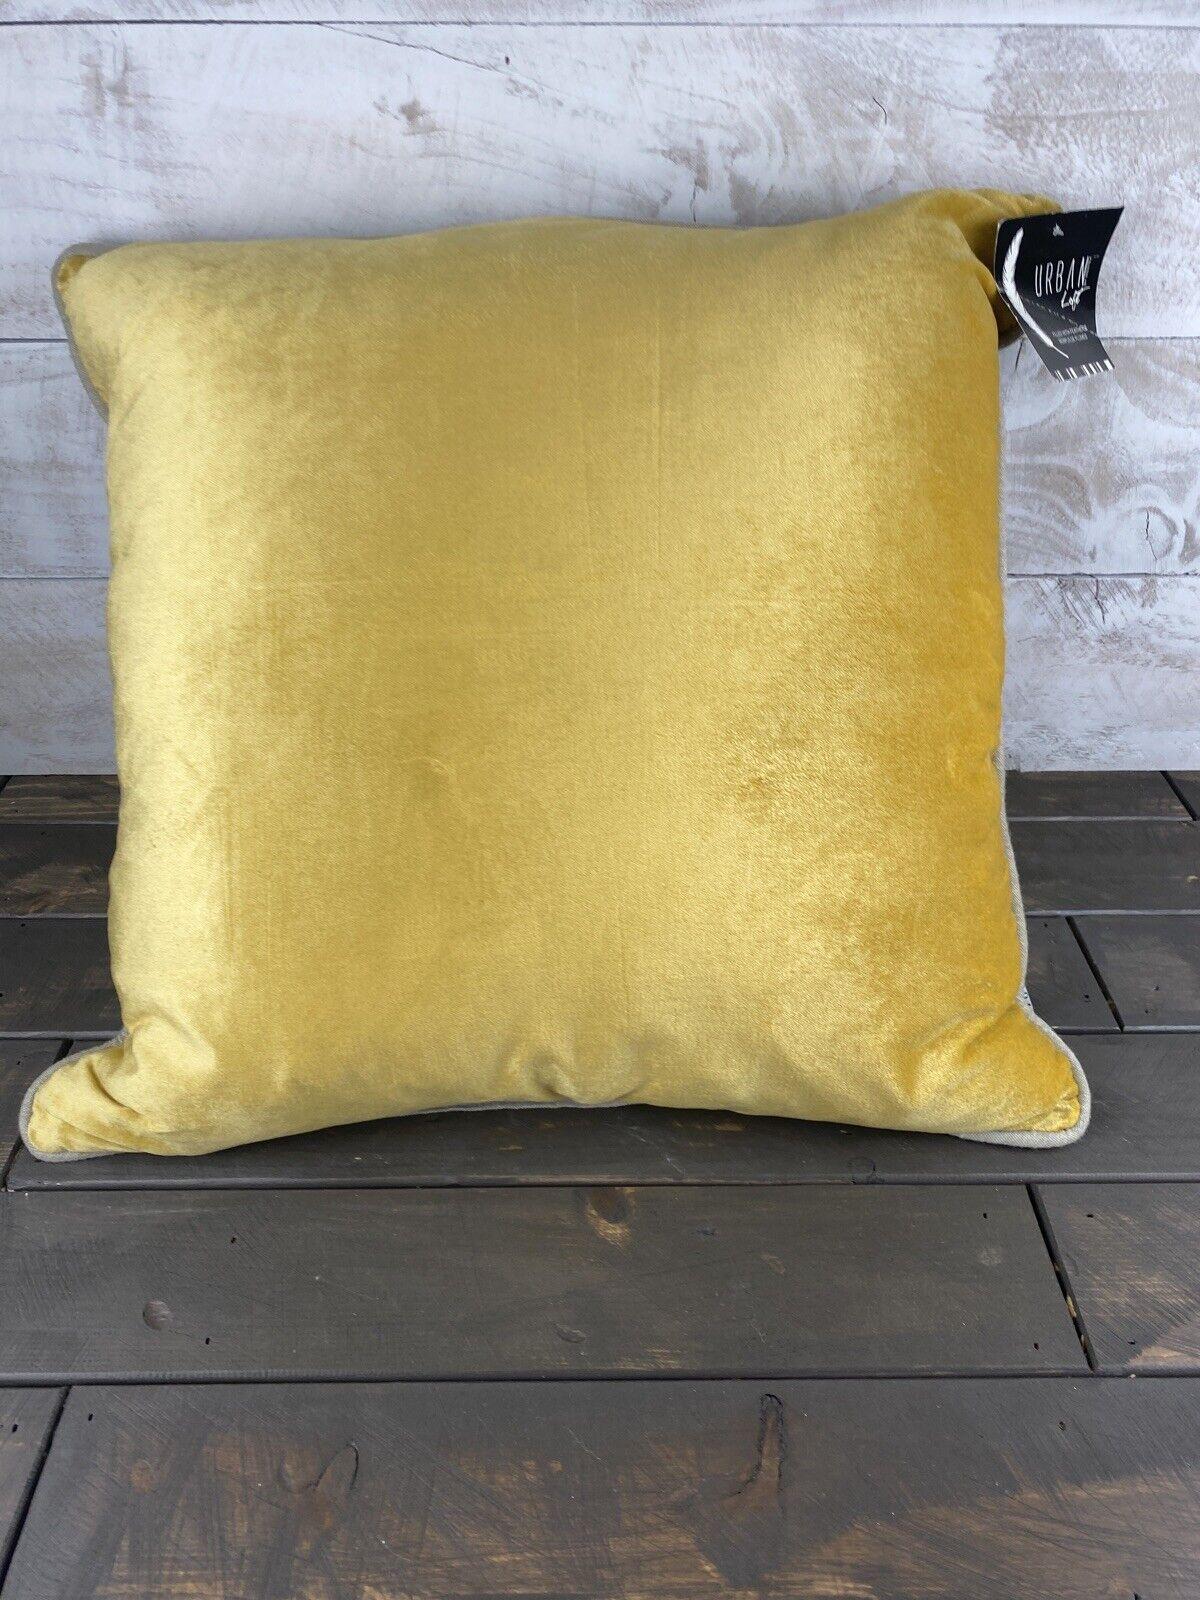 Urban Loft by Westex Budgies Print Feather Filled Decorative Throw Pillow Cushion 20 x 20